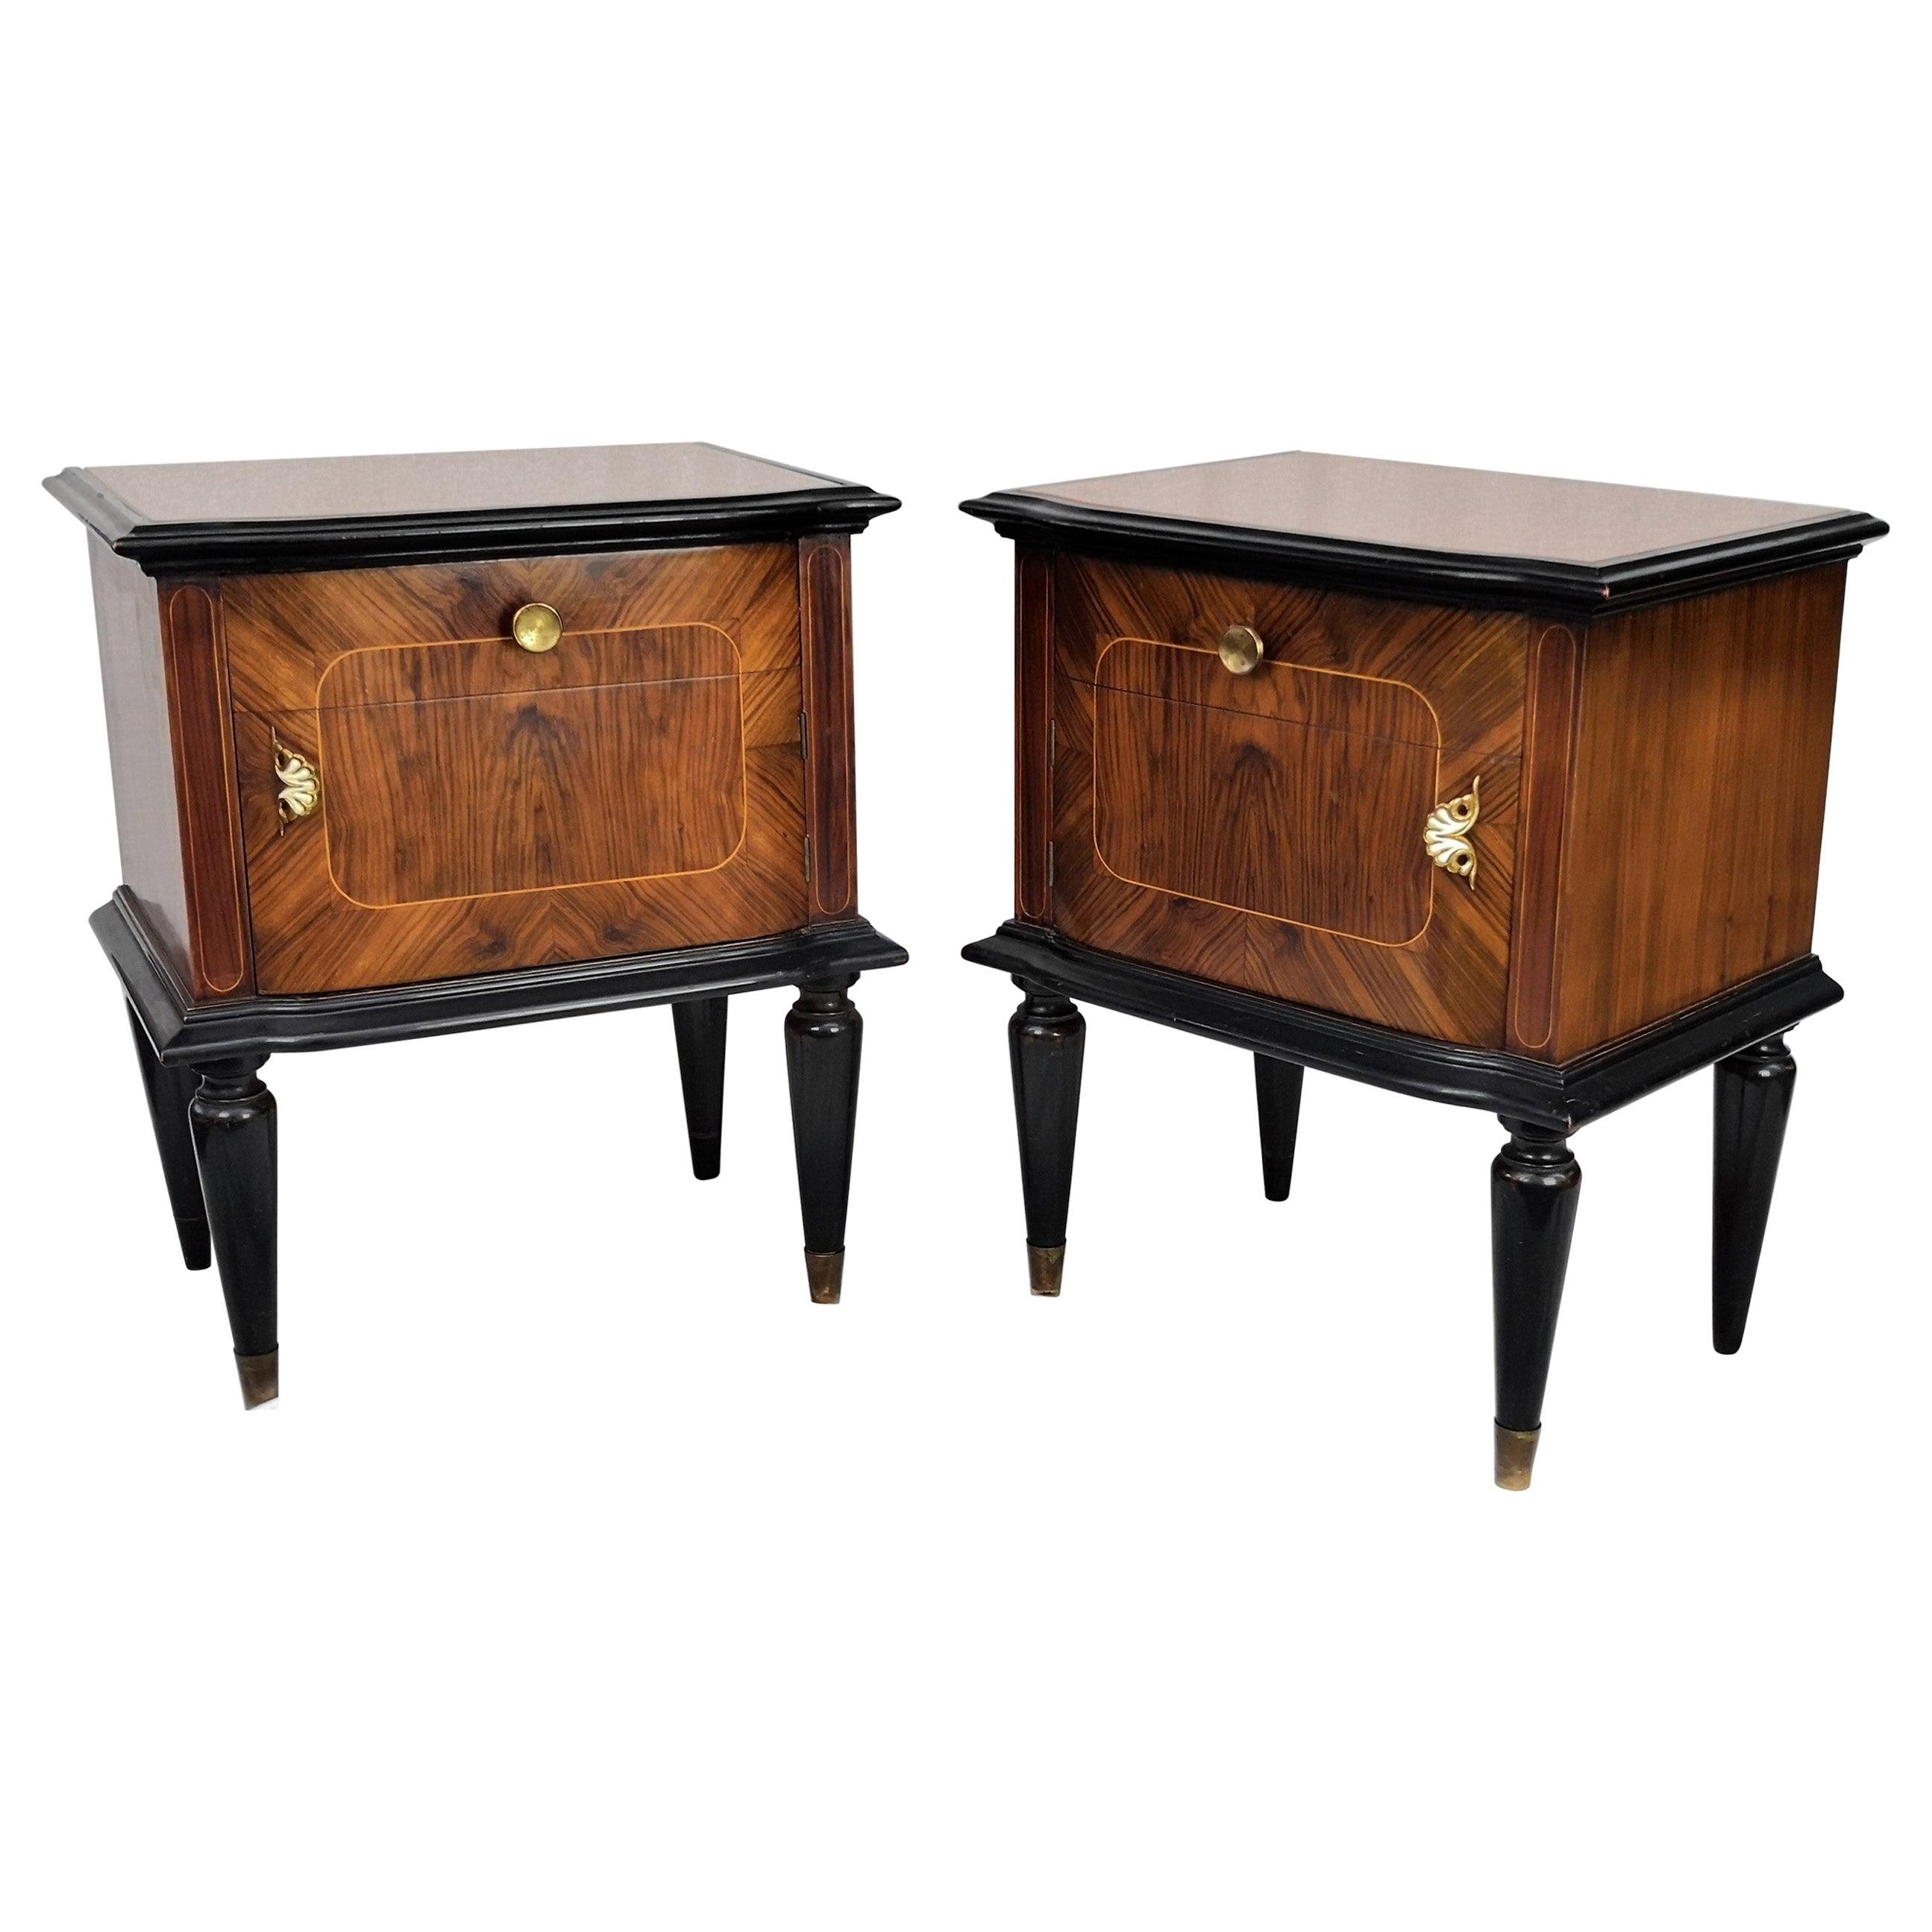 Pair of Midcentury Italian Art Deco Nightstands Bedside Tables Wood Brass Glass